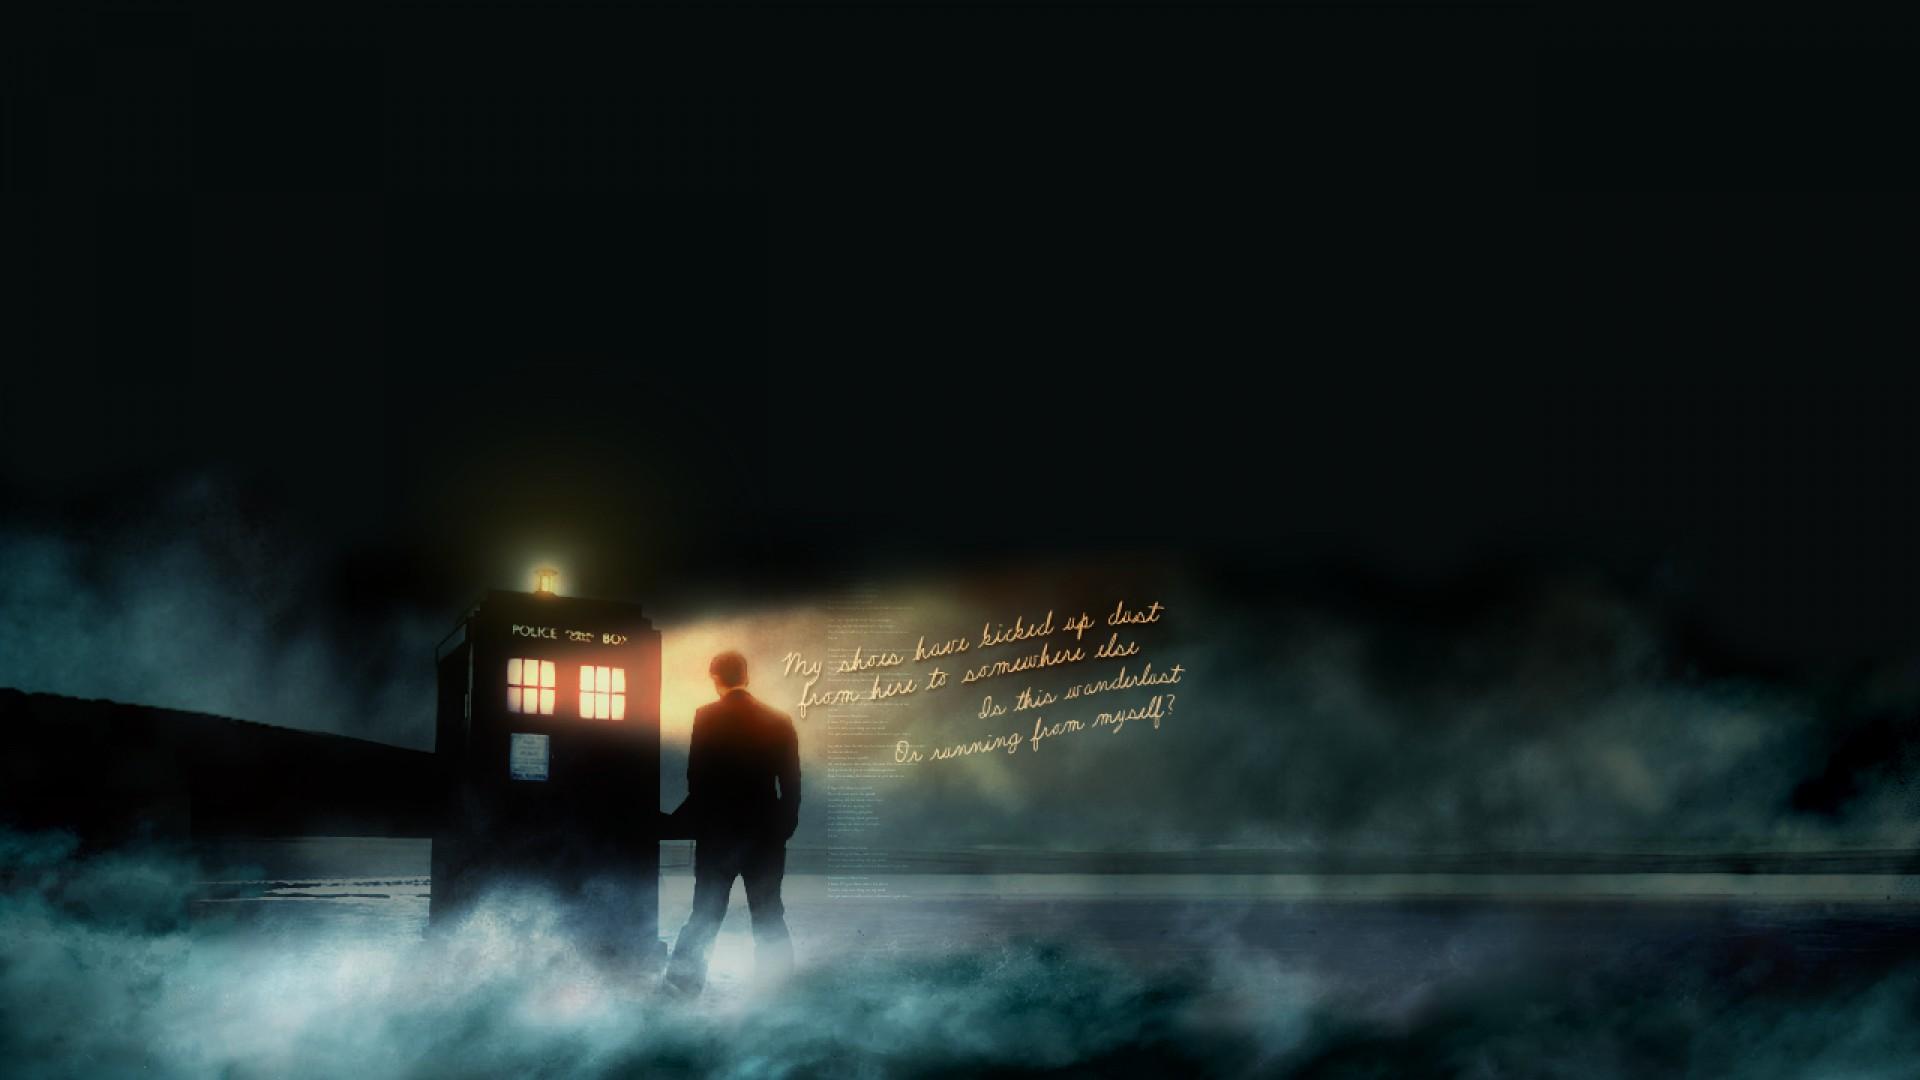 78 Doctor Who Wallpapers On Wallpapersafari